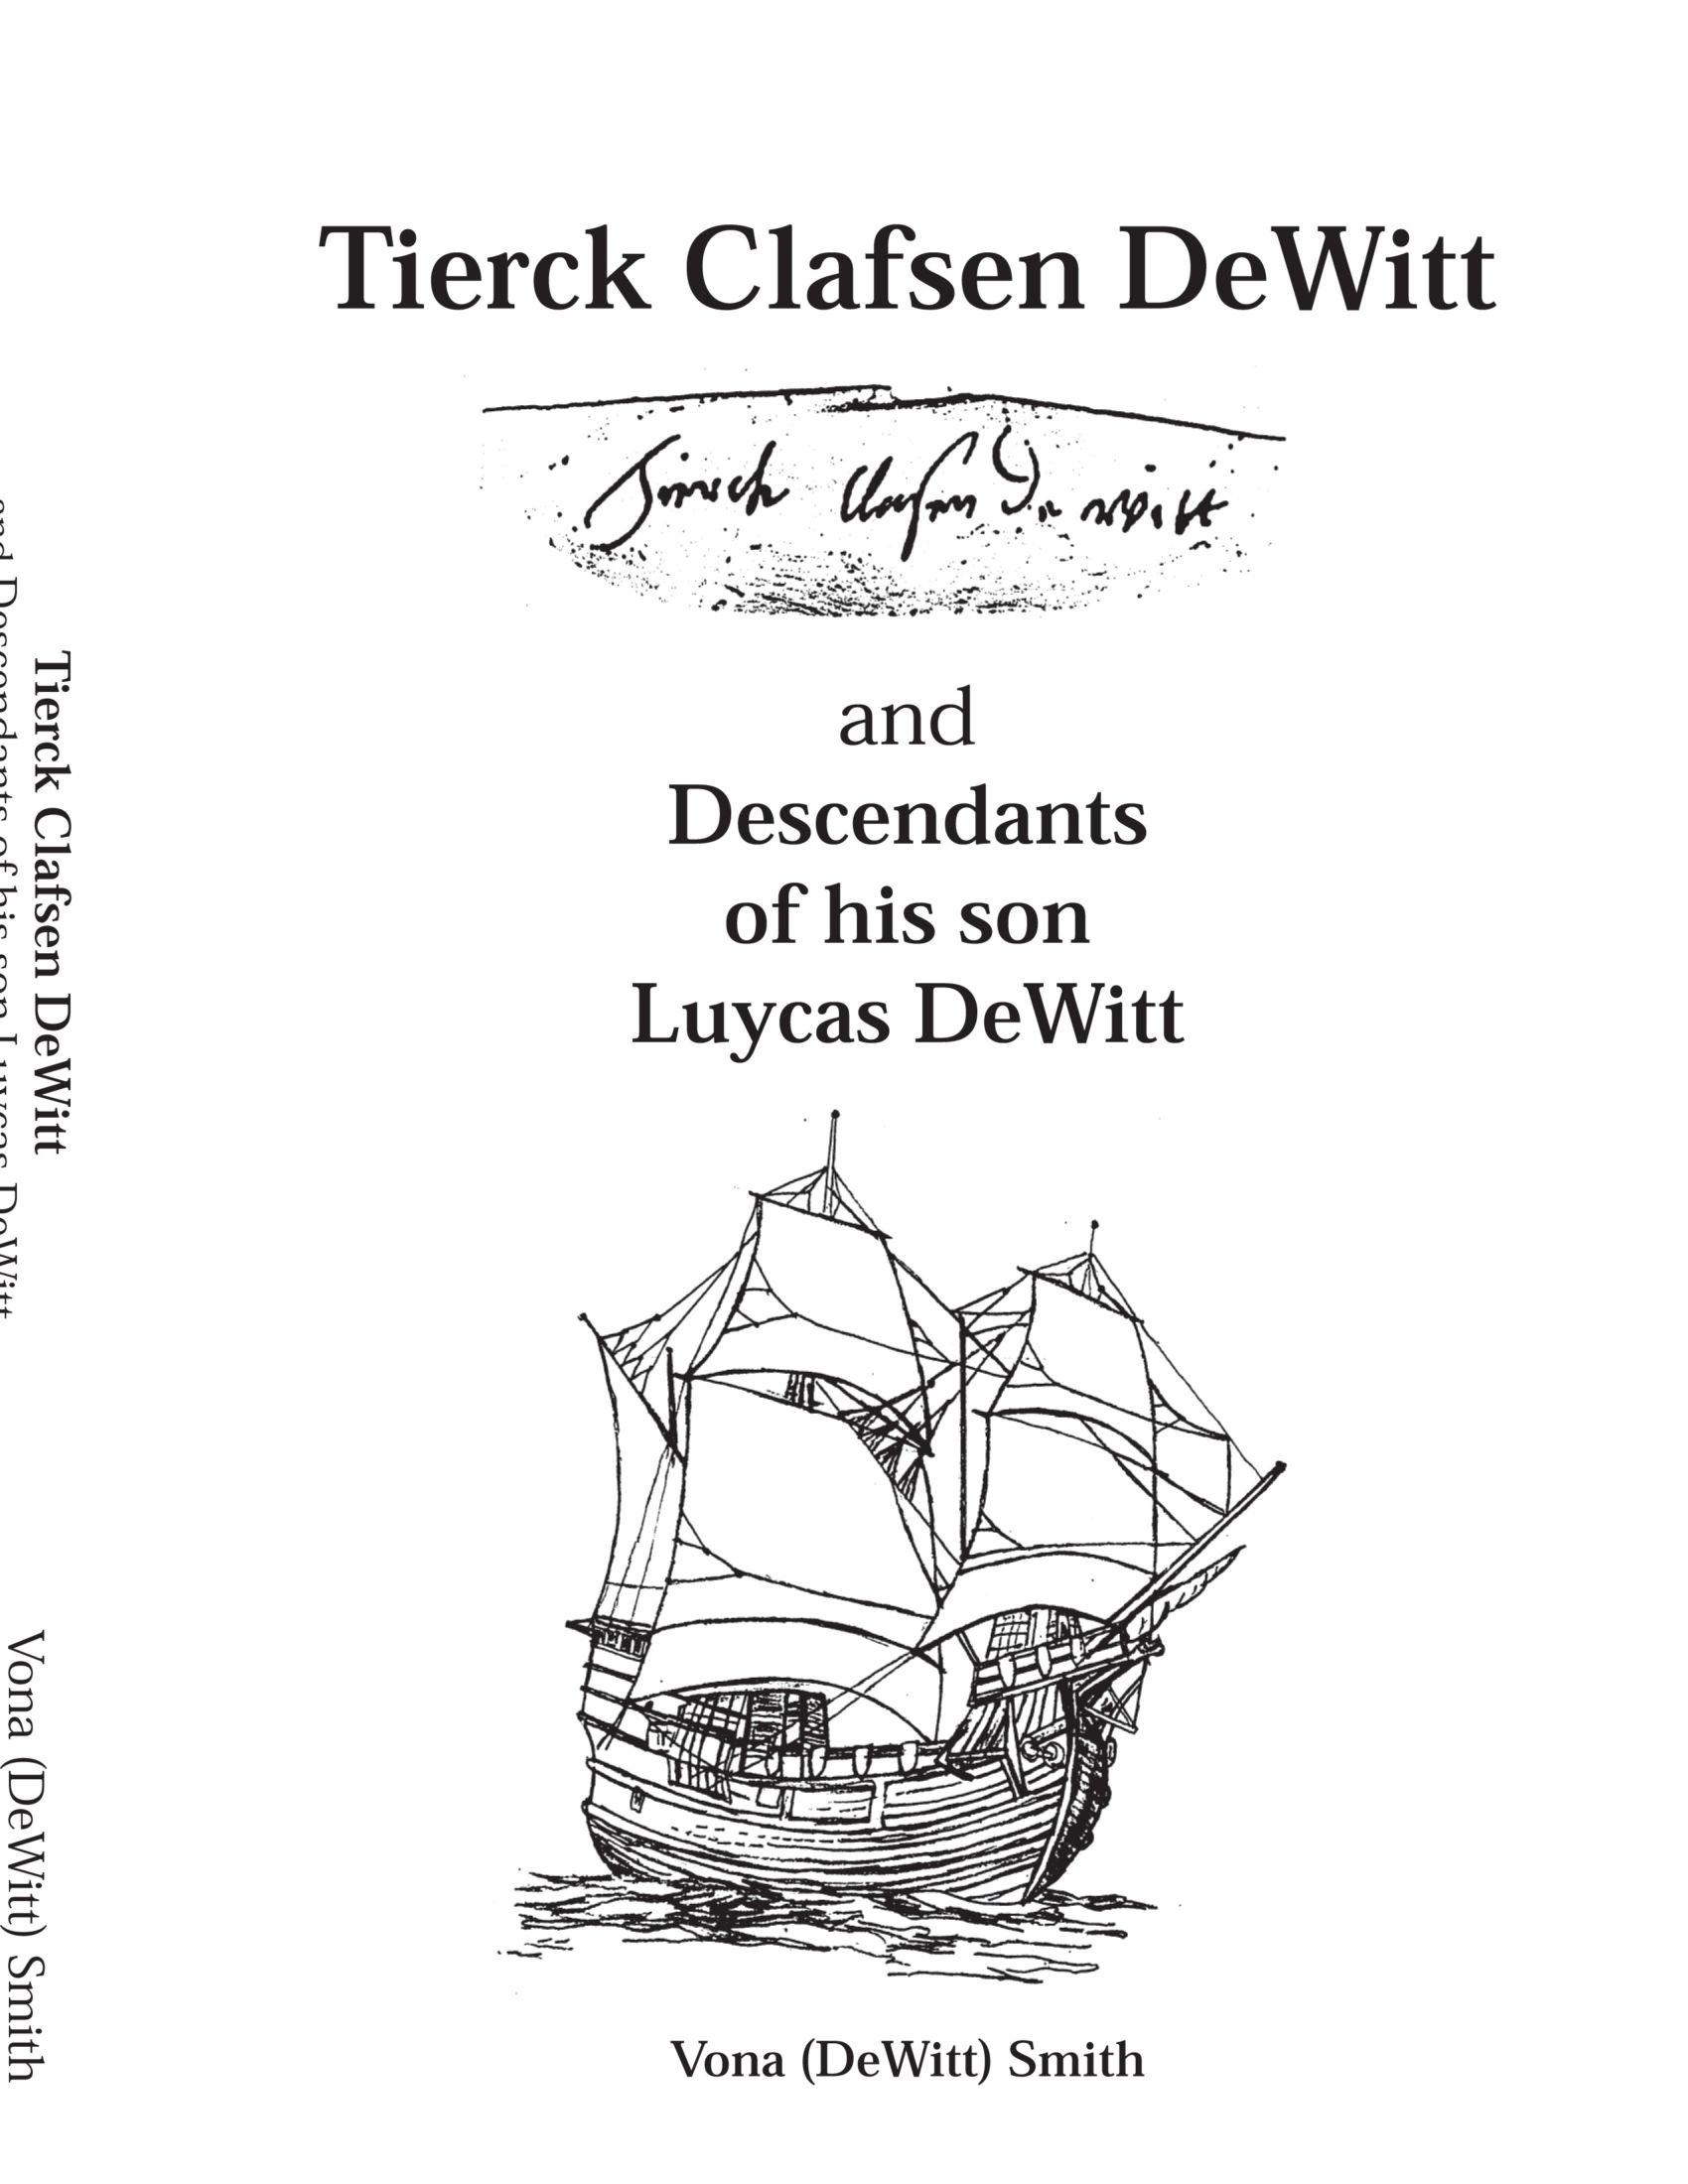 Download Tierck Clafsen DeWitt and Descendants of His Son Luycas DeWitt pdf